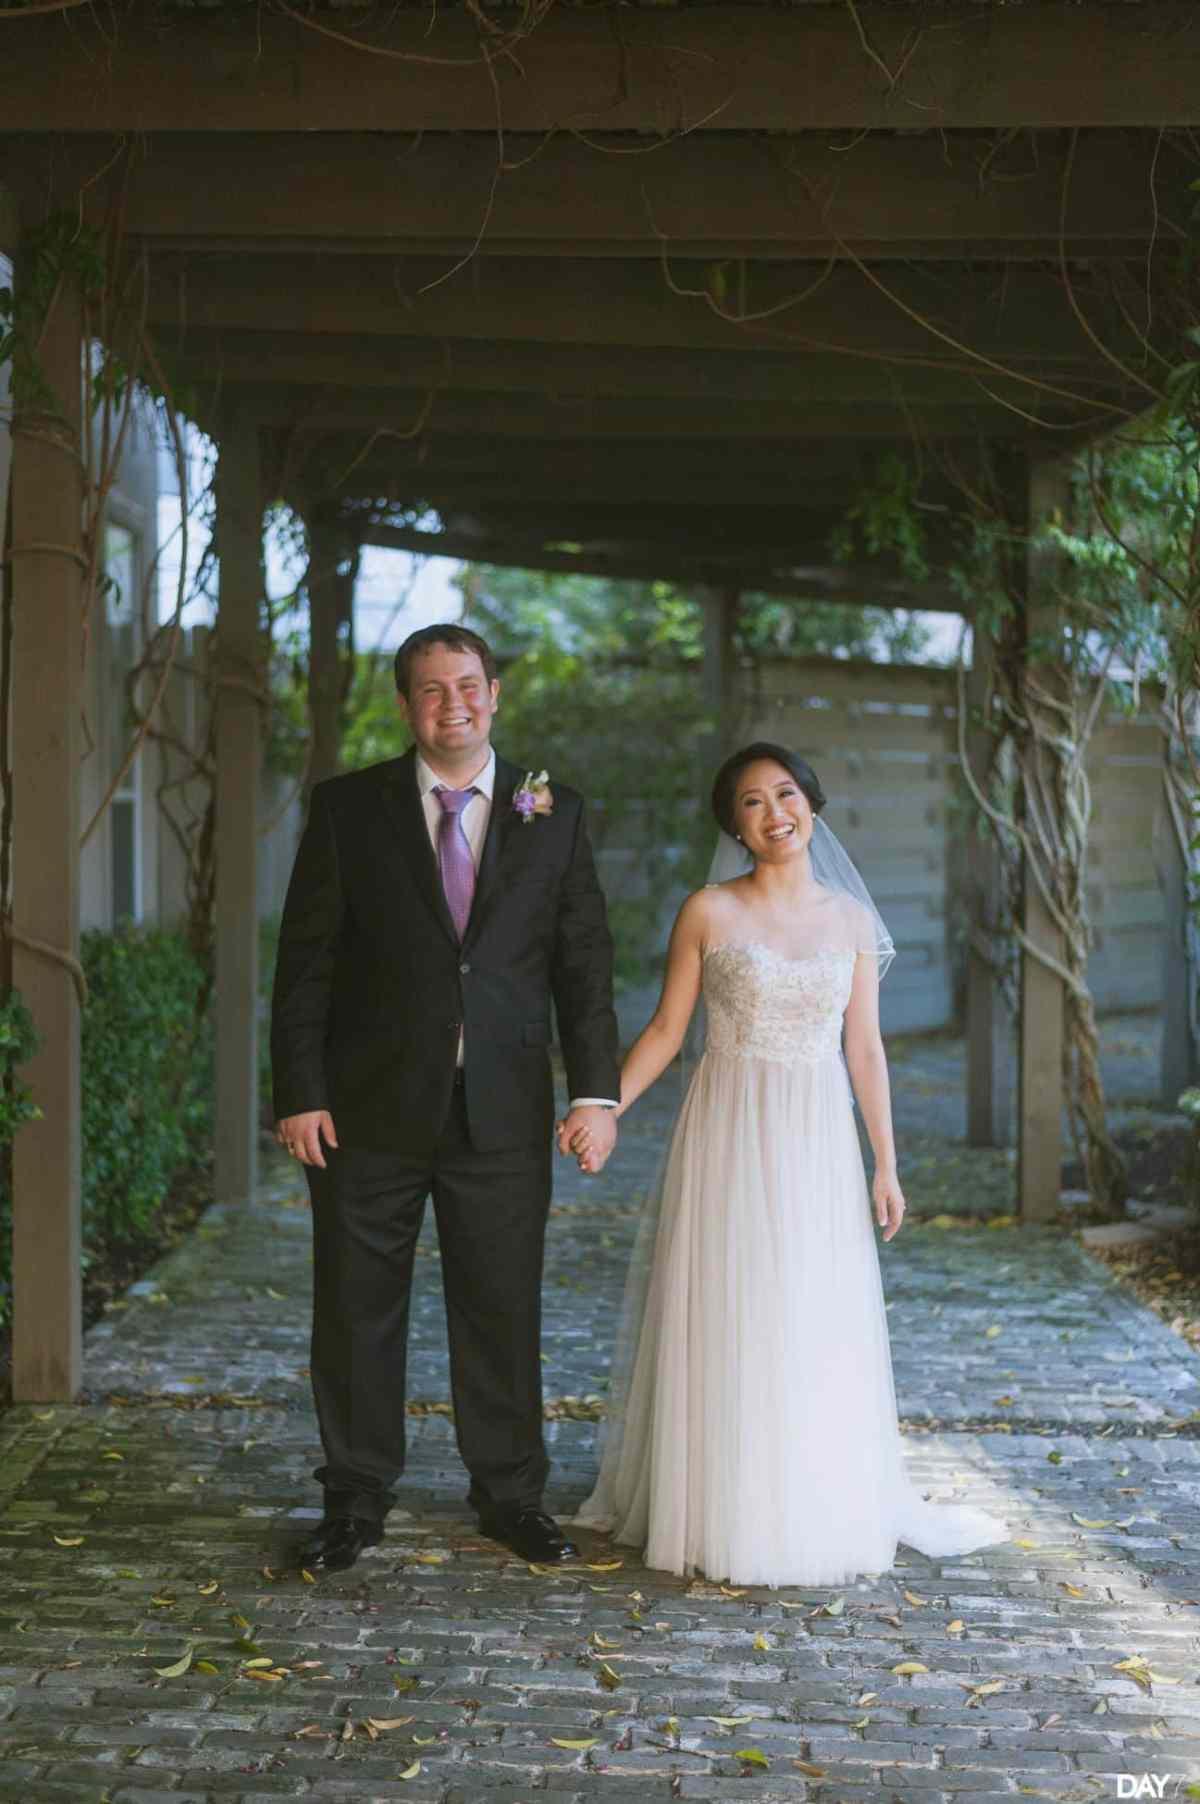 Wedding Photography Houston Prices: Wedding At The Grove Restaurant Houston